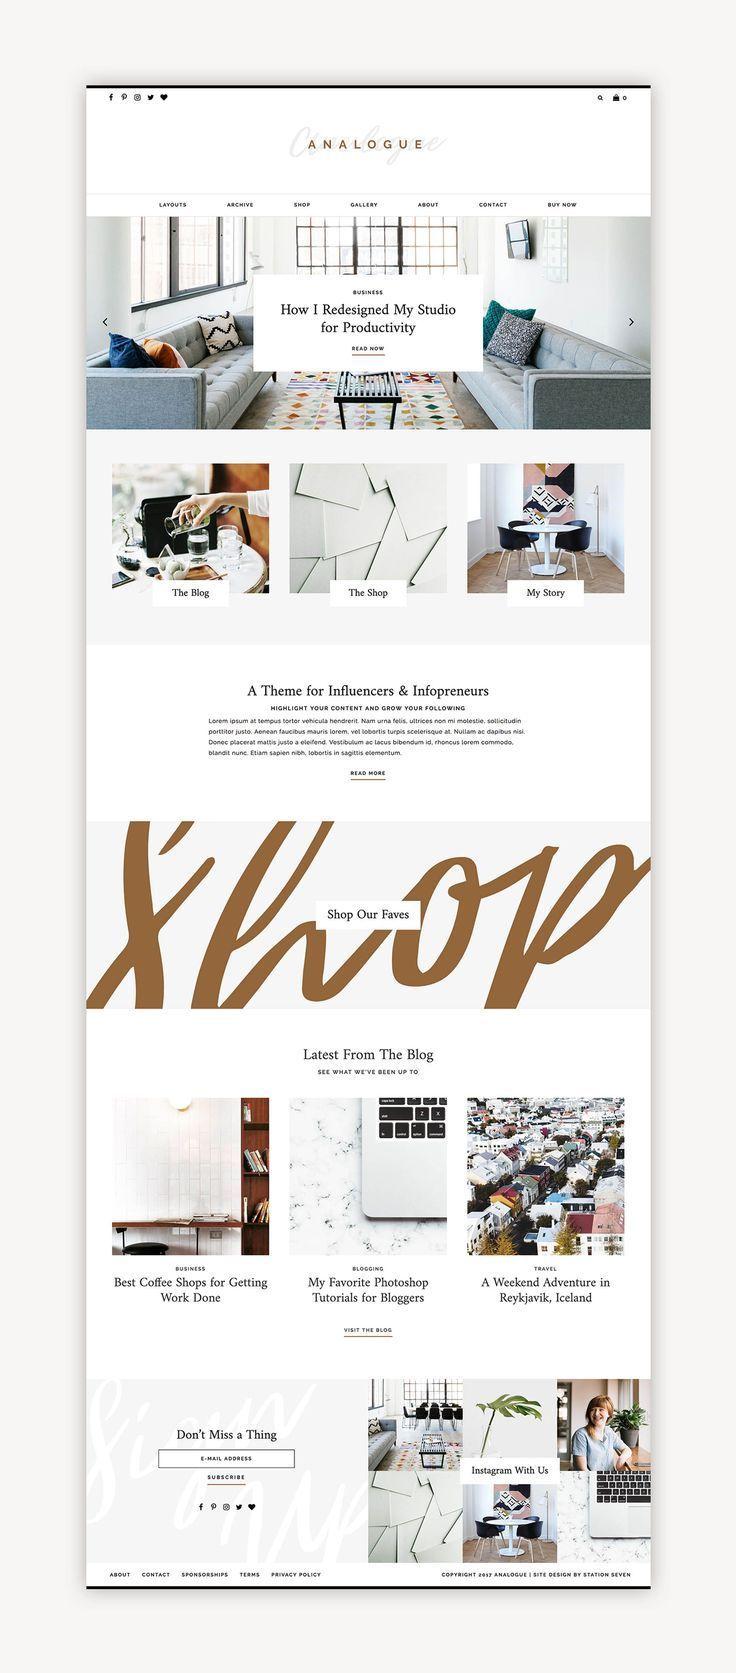 Analogue Wordpress Theme With Images Layout Design Inspiration